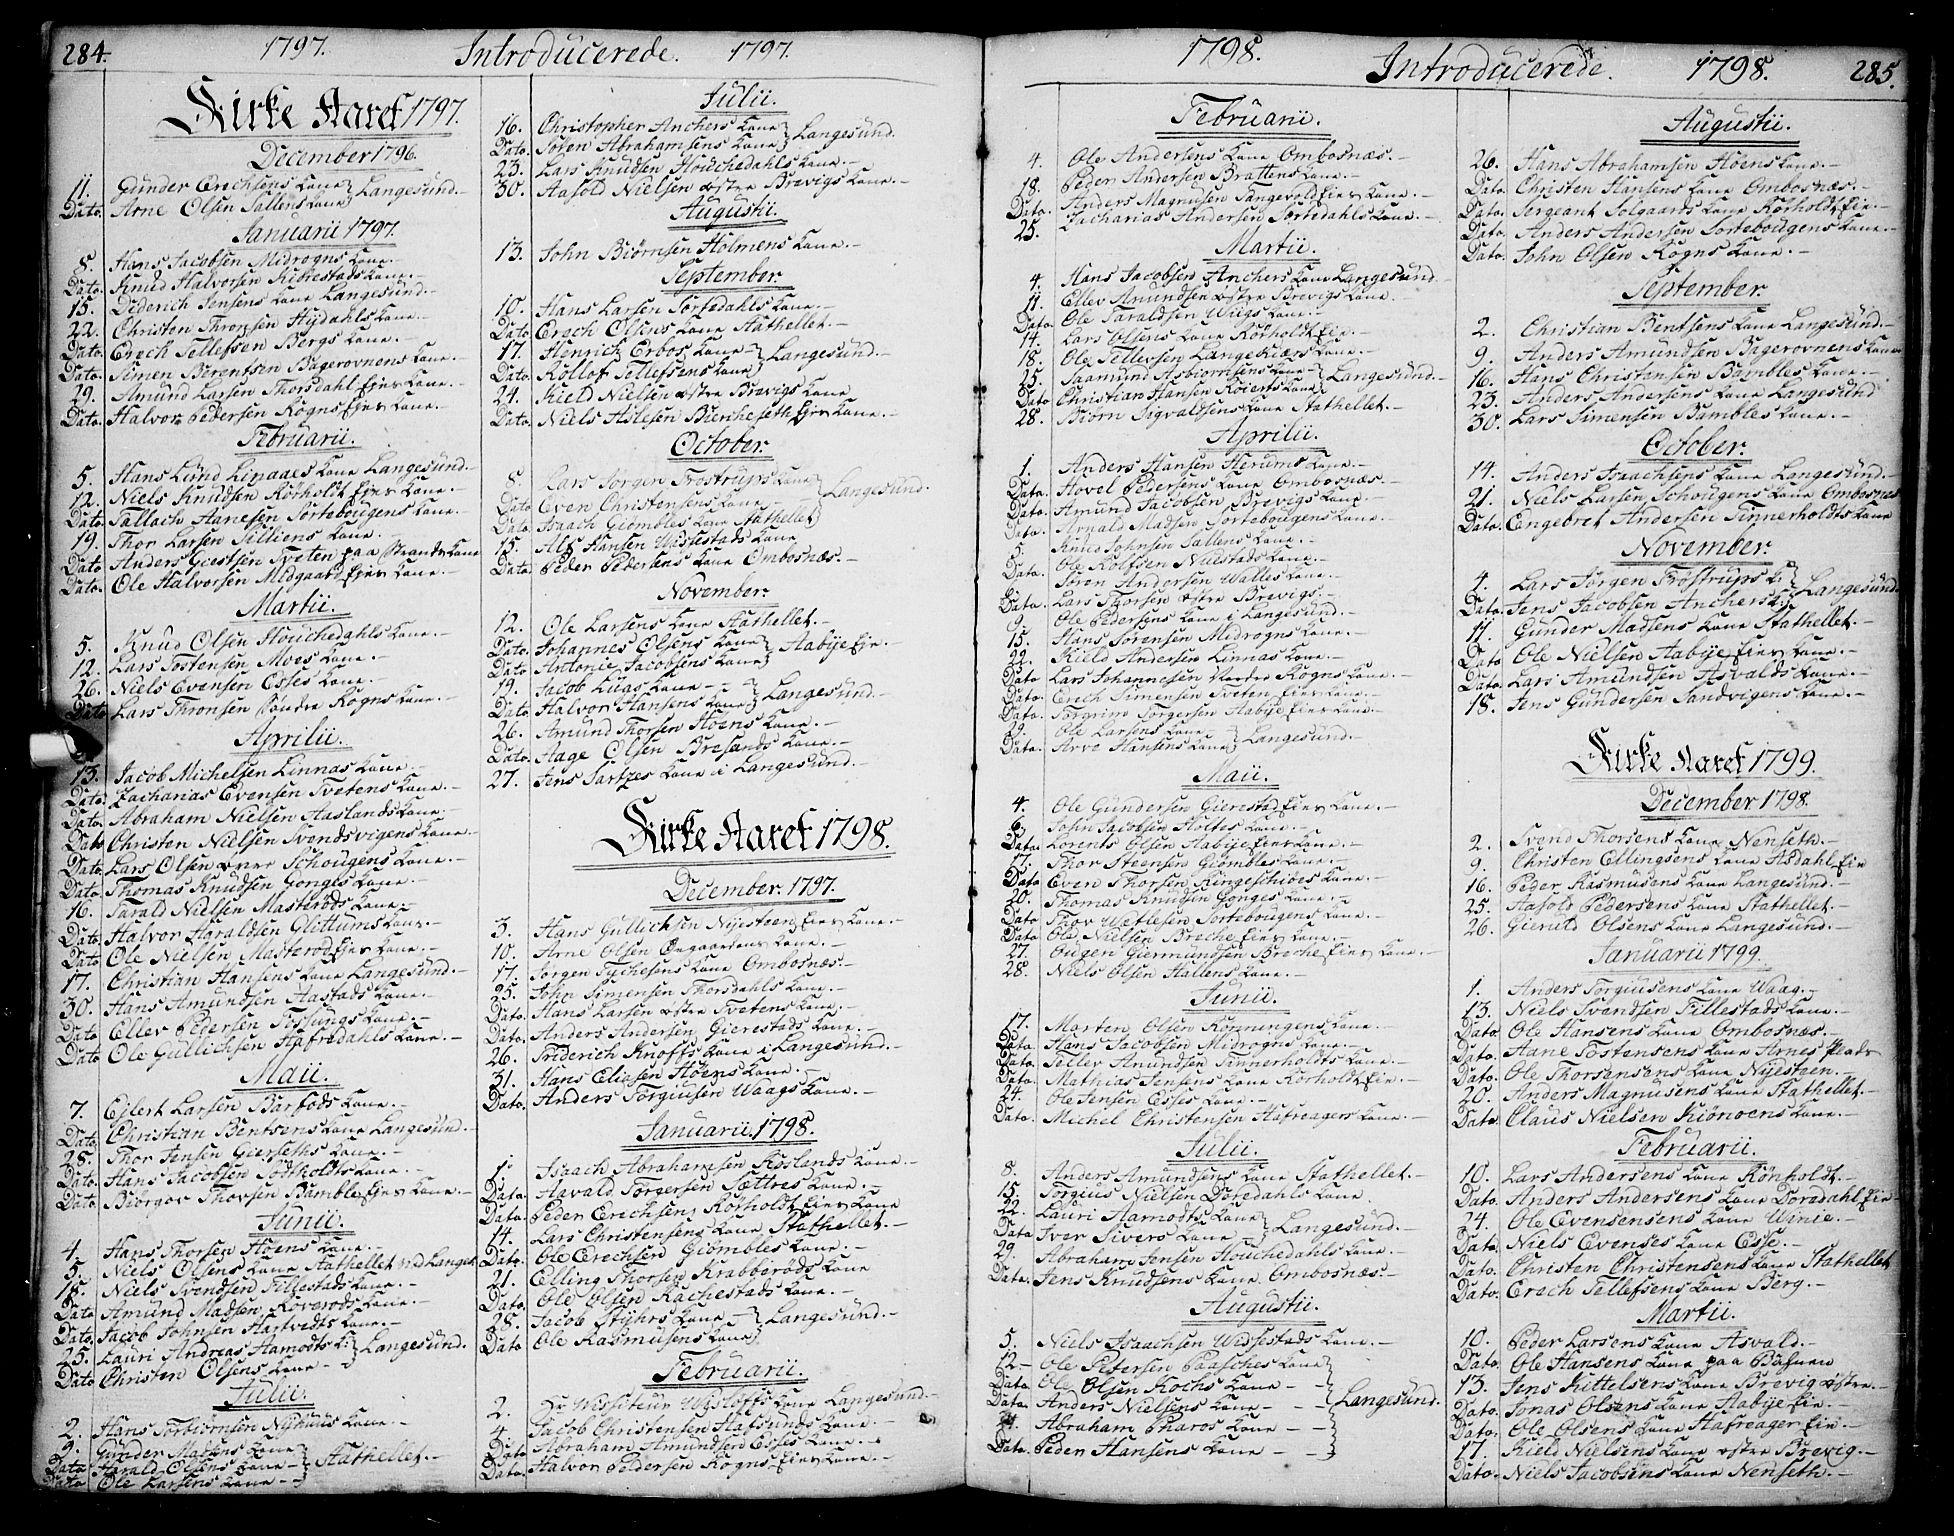 SAKO, Bamble kirkebøker, F/Fa/L0002: Ministerialbok nr. I 2, 1775-1814, s. 284-285